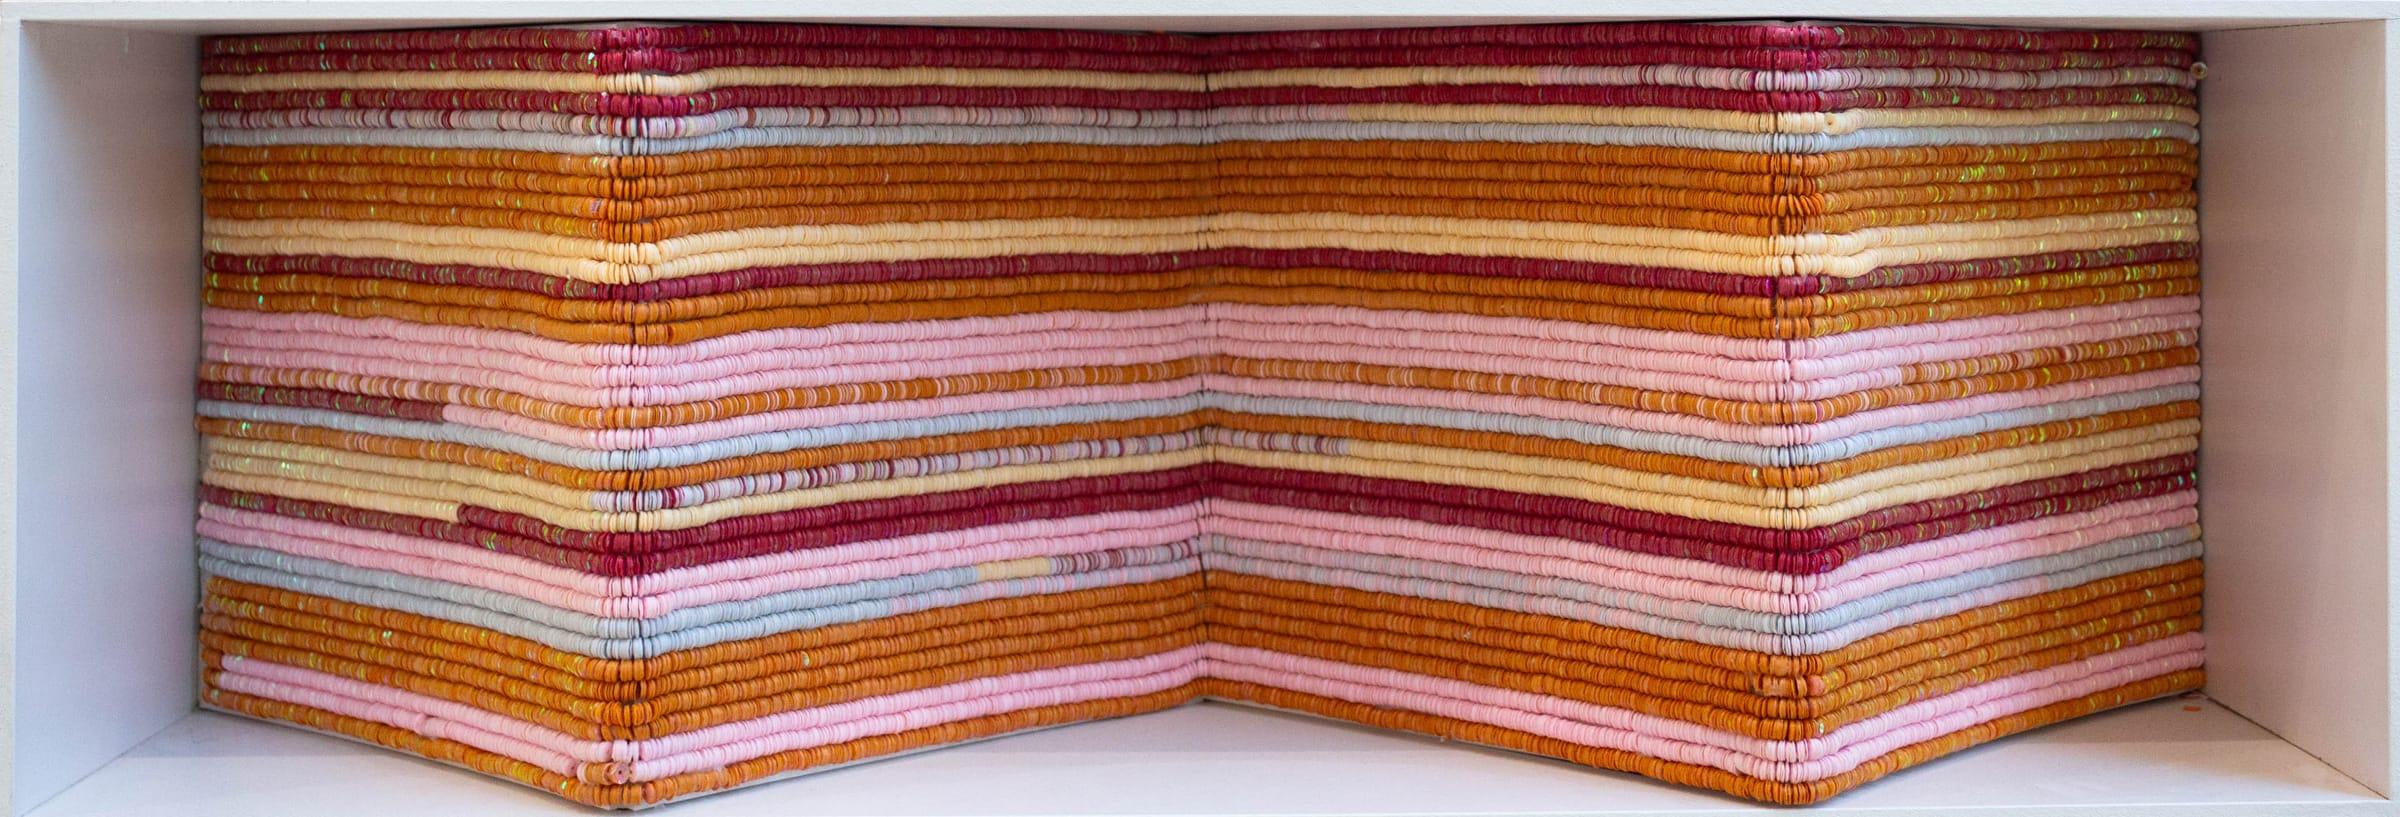 <span class=&#34;link fancybox-details-link&#34;><a href=&#34;/artists/85-leanne-shakenovsky/works/3127-leanne-shakenovsky-waves-ii-2017/&#34;>View Detail Page</a></span><div class=&#34;artist&#34;><strong>Leanne Shakenovsky</strong></div> <div class=&#34;title&#34;><em>Waves II</em>, 2017</div> <div class=&#34;medium&#34;>Sequins, Fishing Line, Foamcore, Wood Glue</div> <div class=&#34;dimensions&#34;>25cm x 75cm</div><div class=&#34;price&#34;>R12,000.00</div>